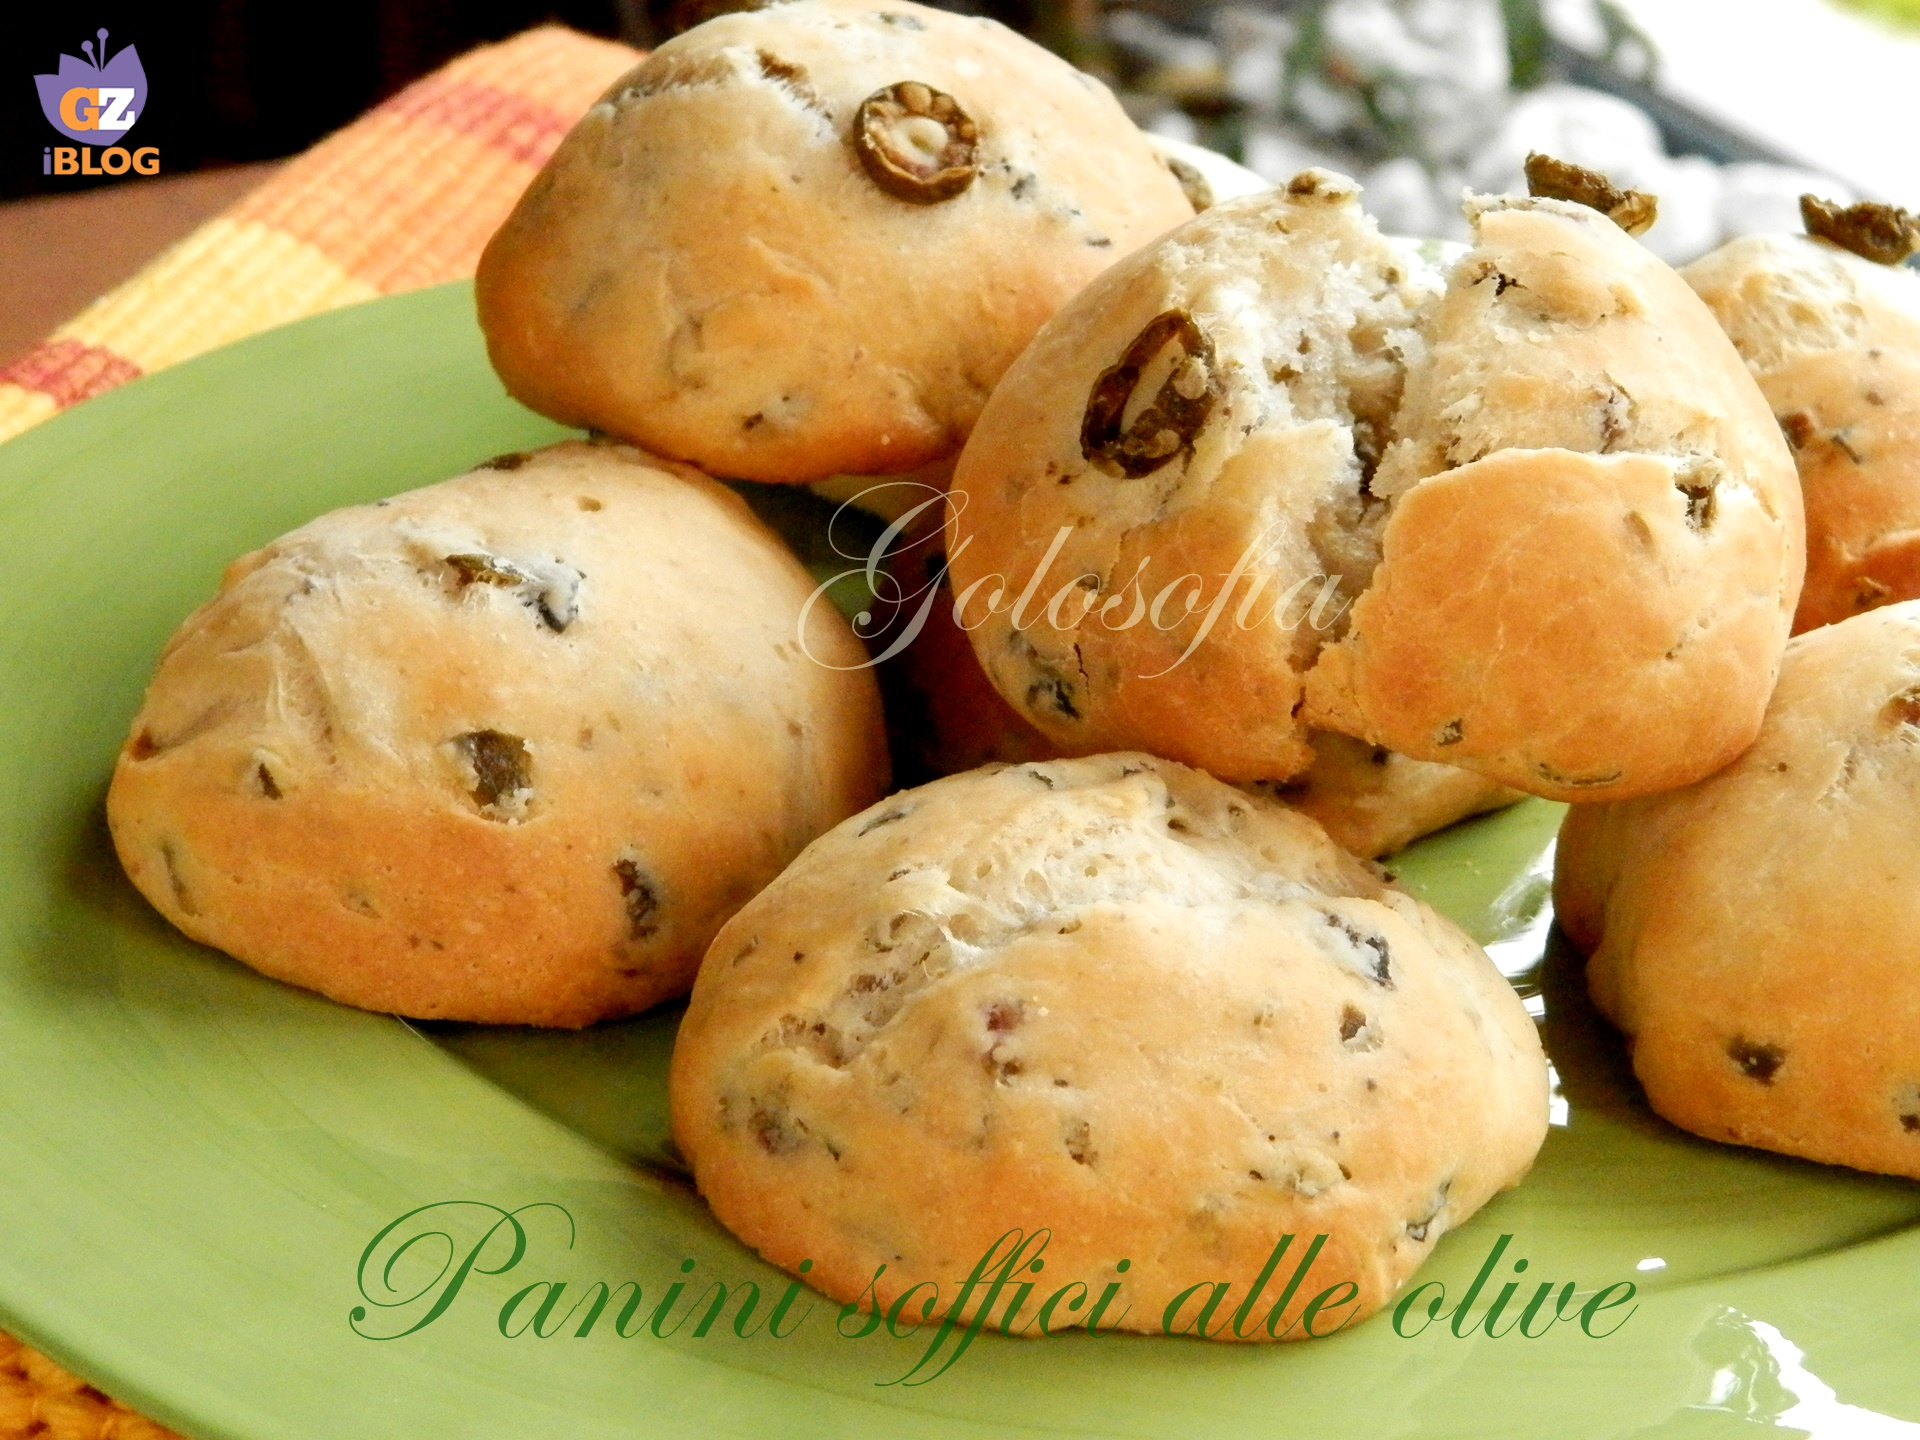 Panini soffici alle olive-ricetta pane e lievitati-golosofia